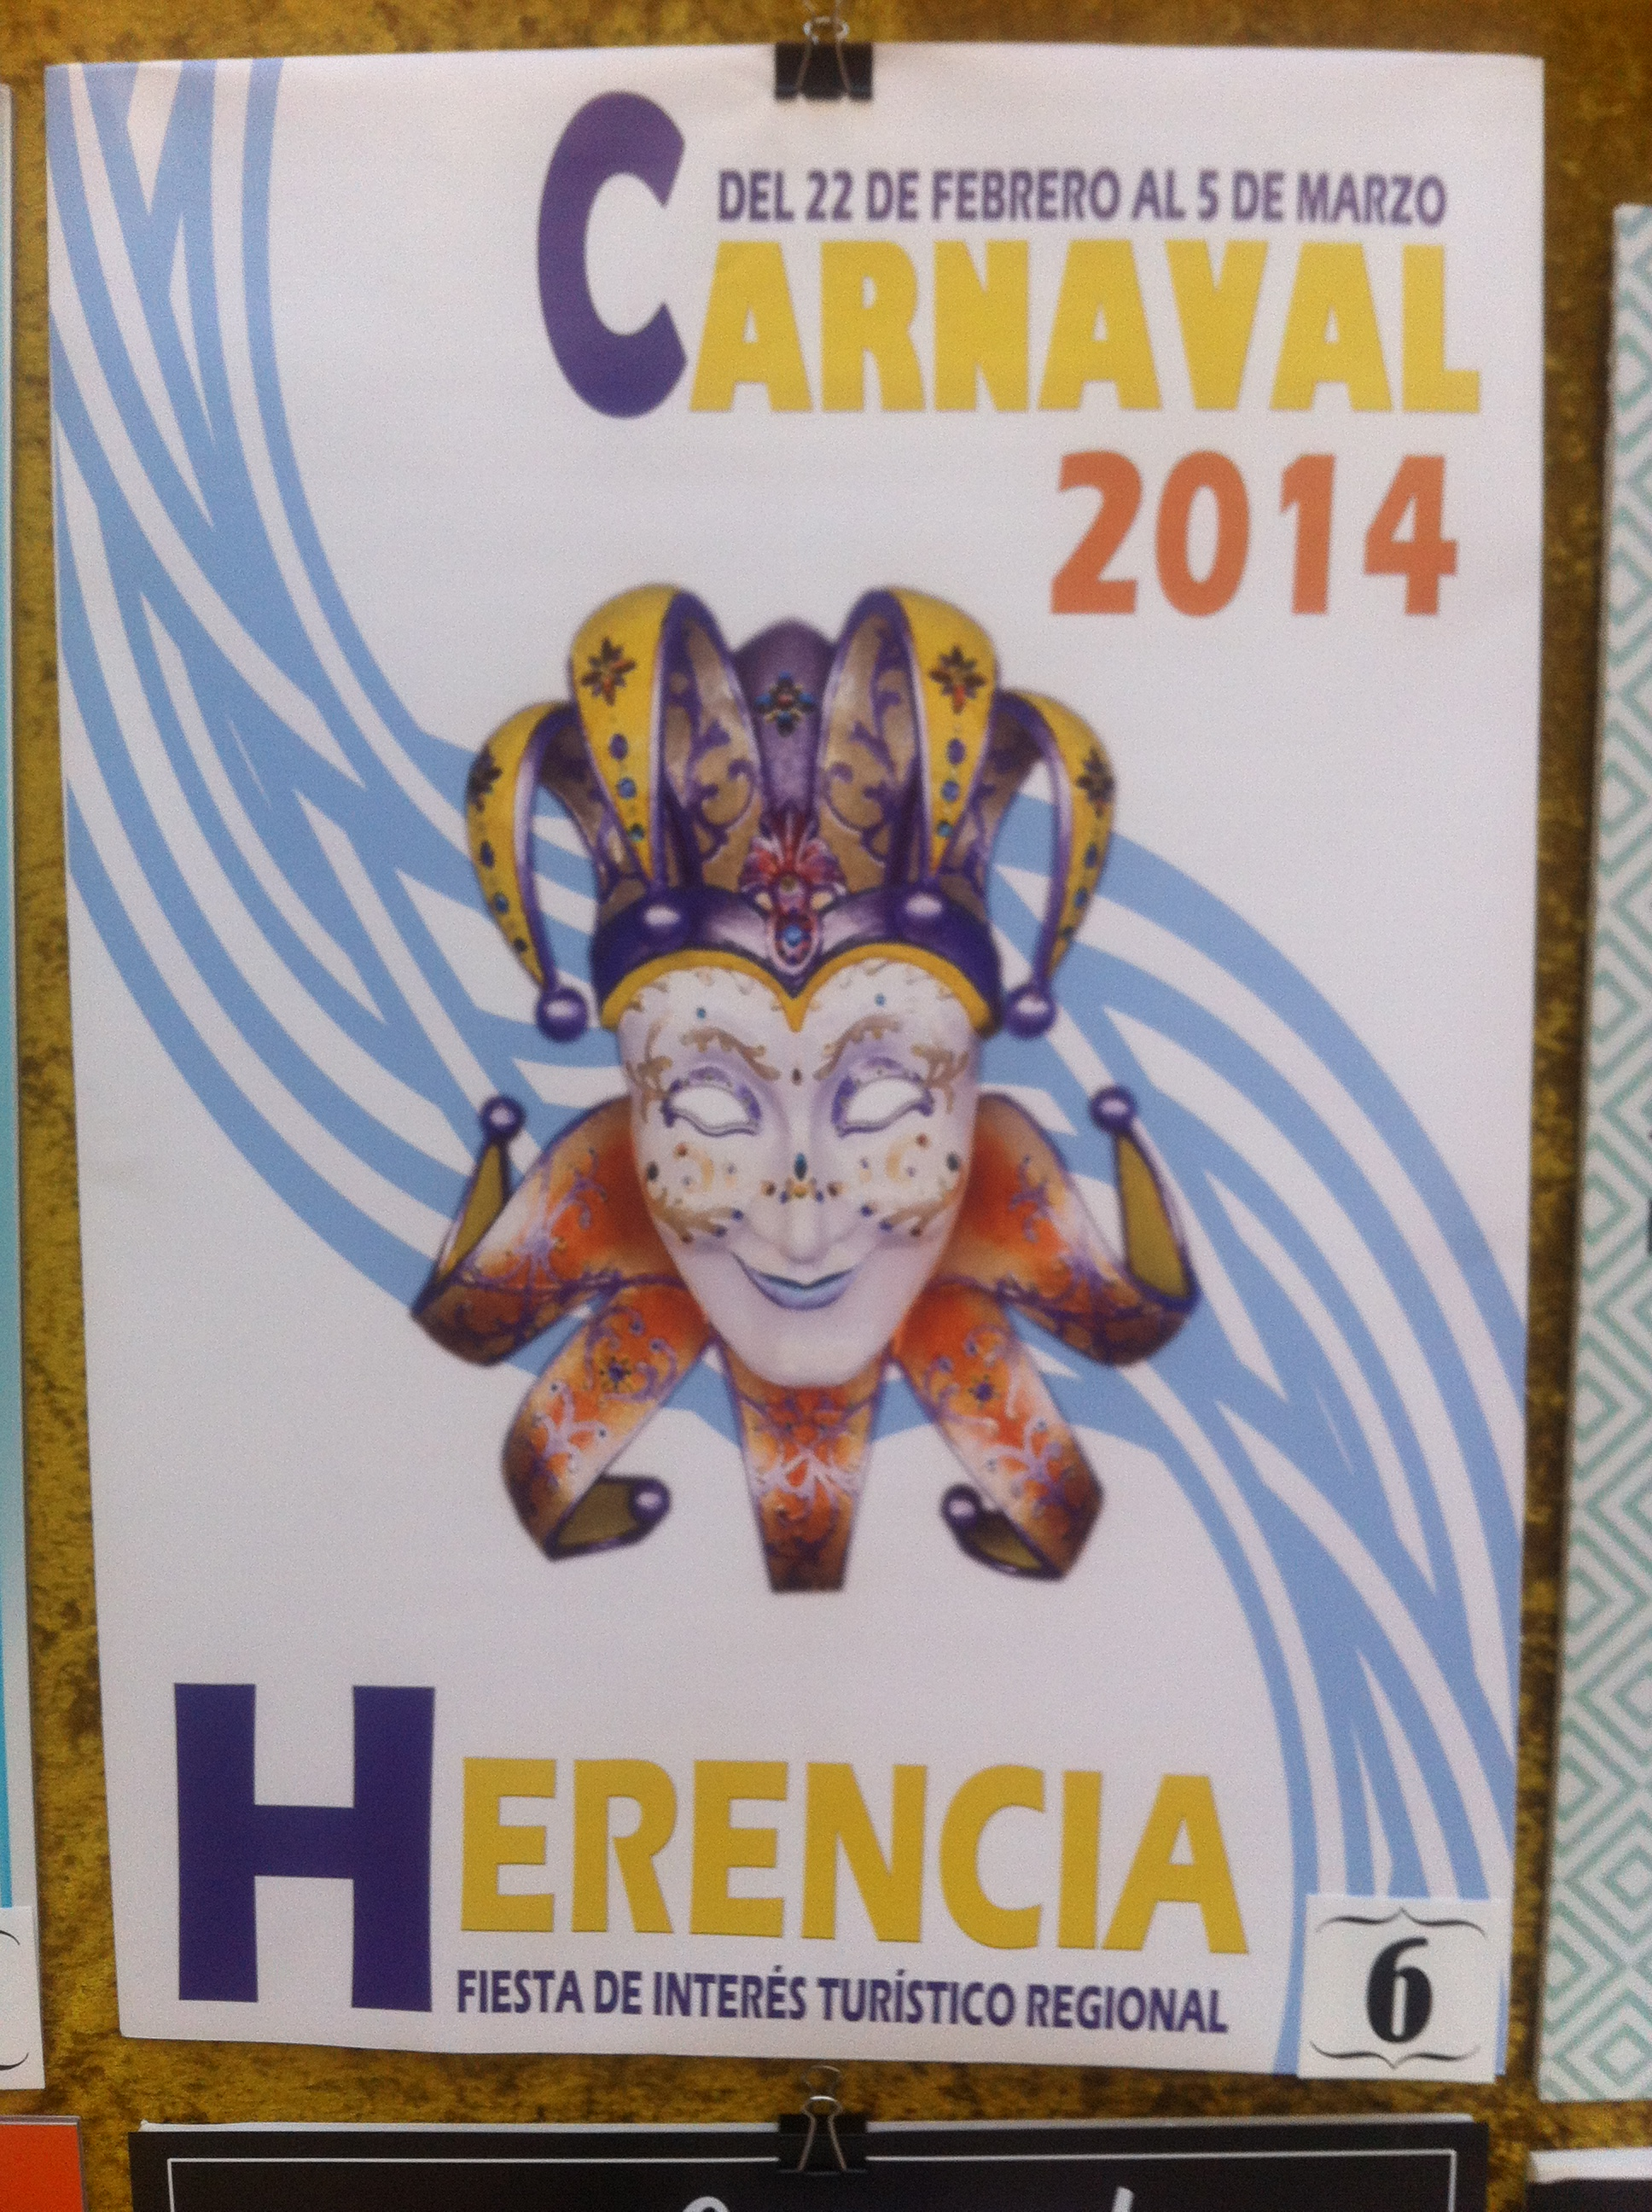 Concurso Carteles Carnaval 2014 (6)